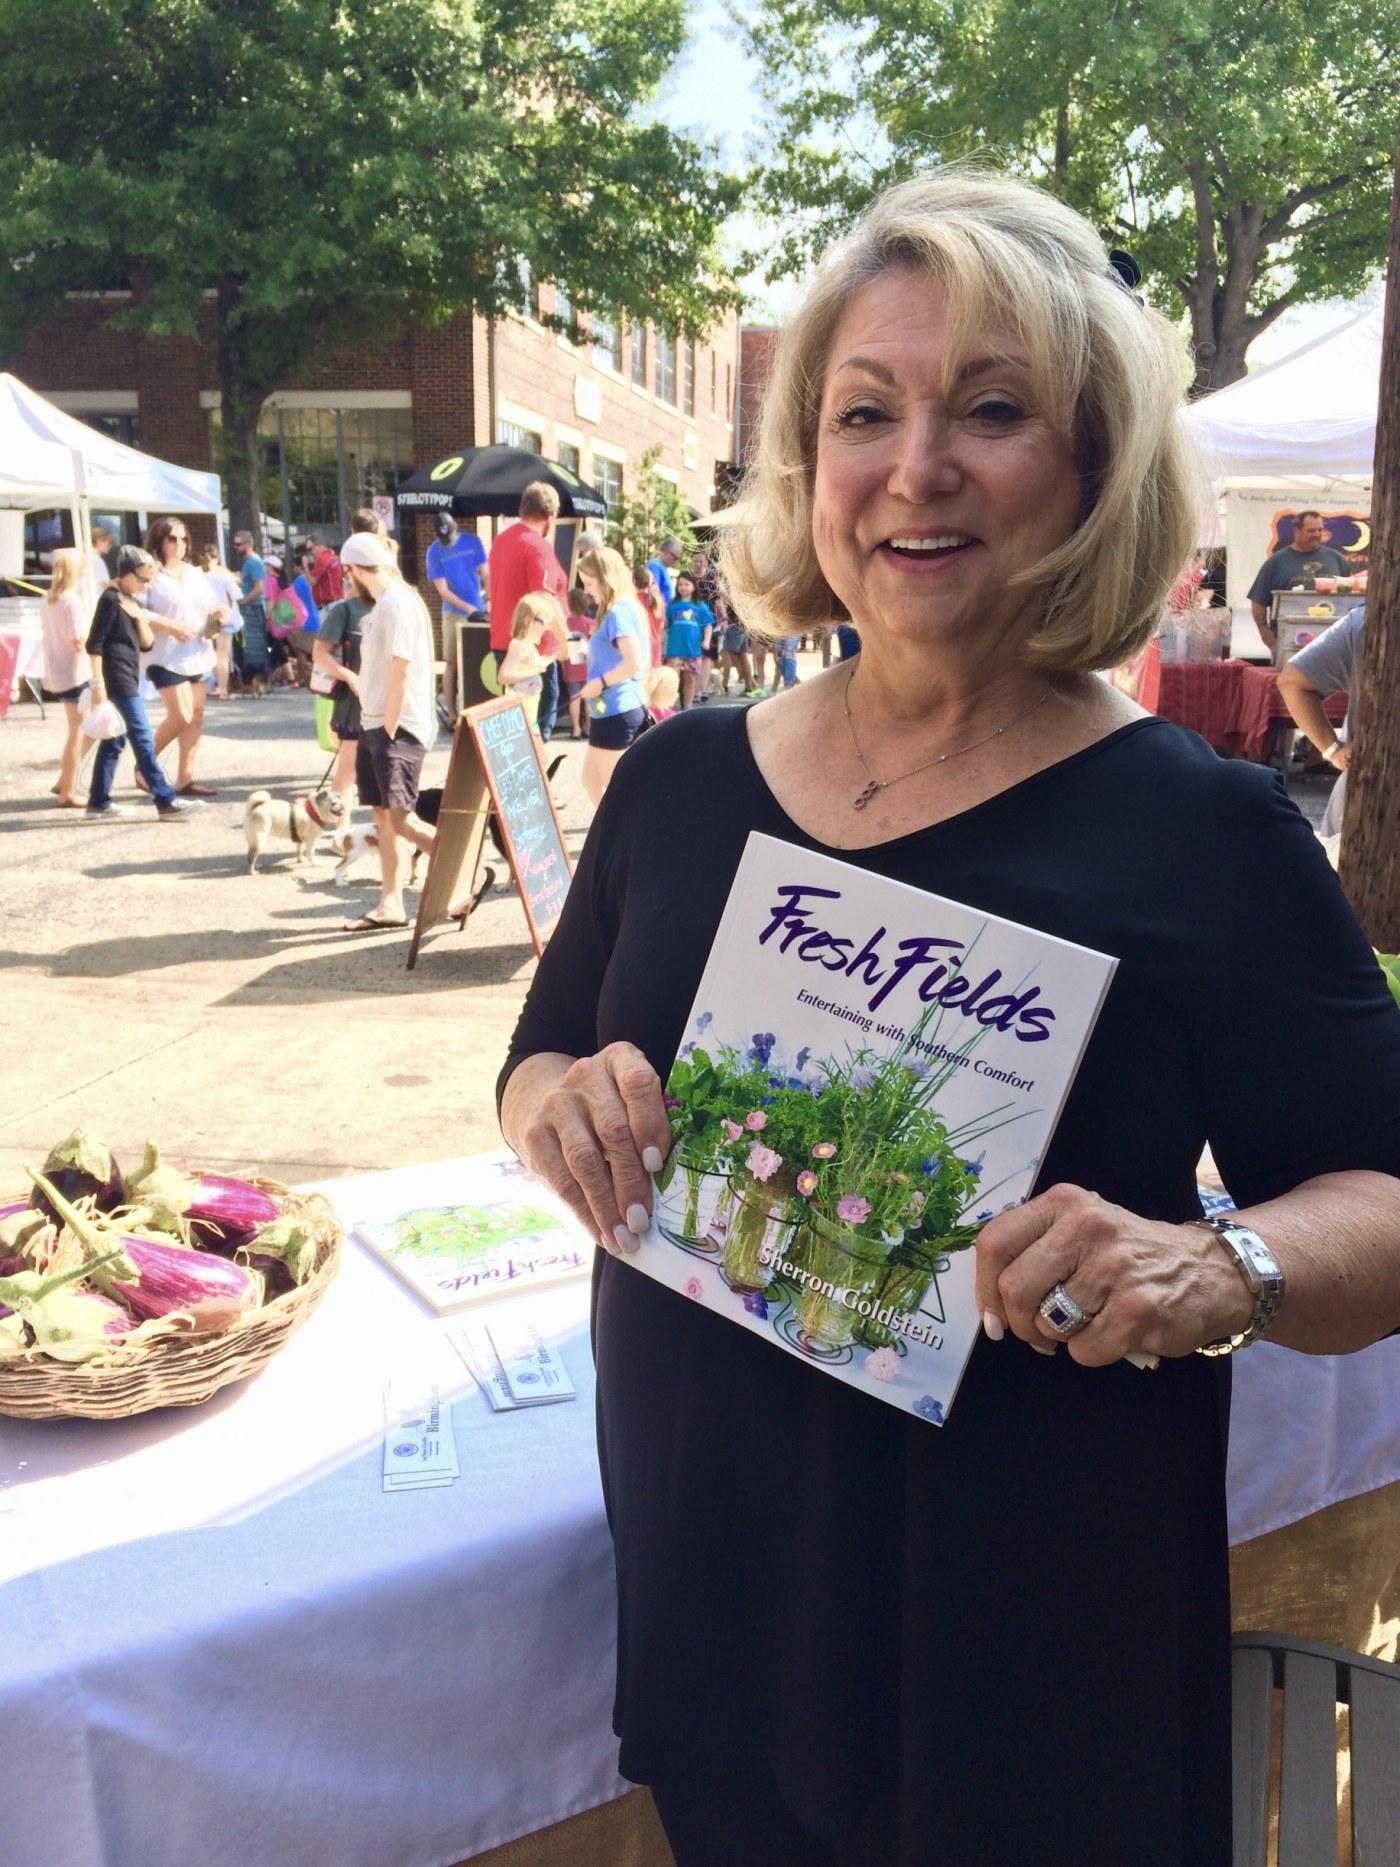 Birmingham Alabama, top Birmingham women in food, the Market at Pepper Place